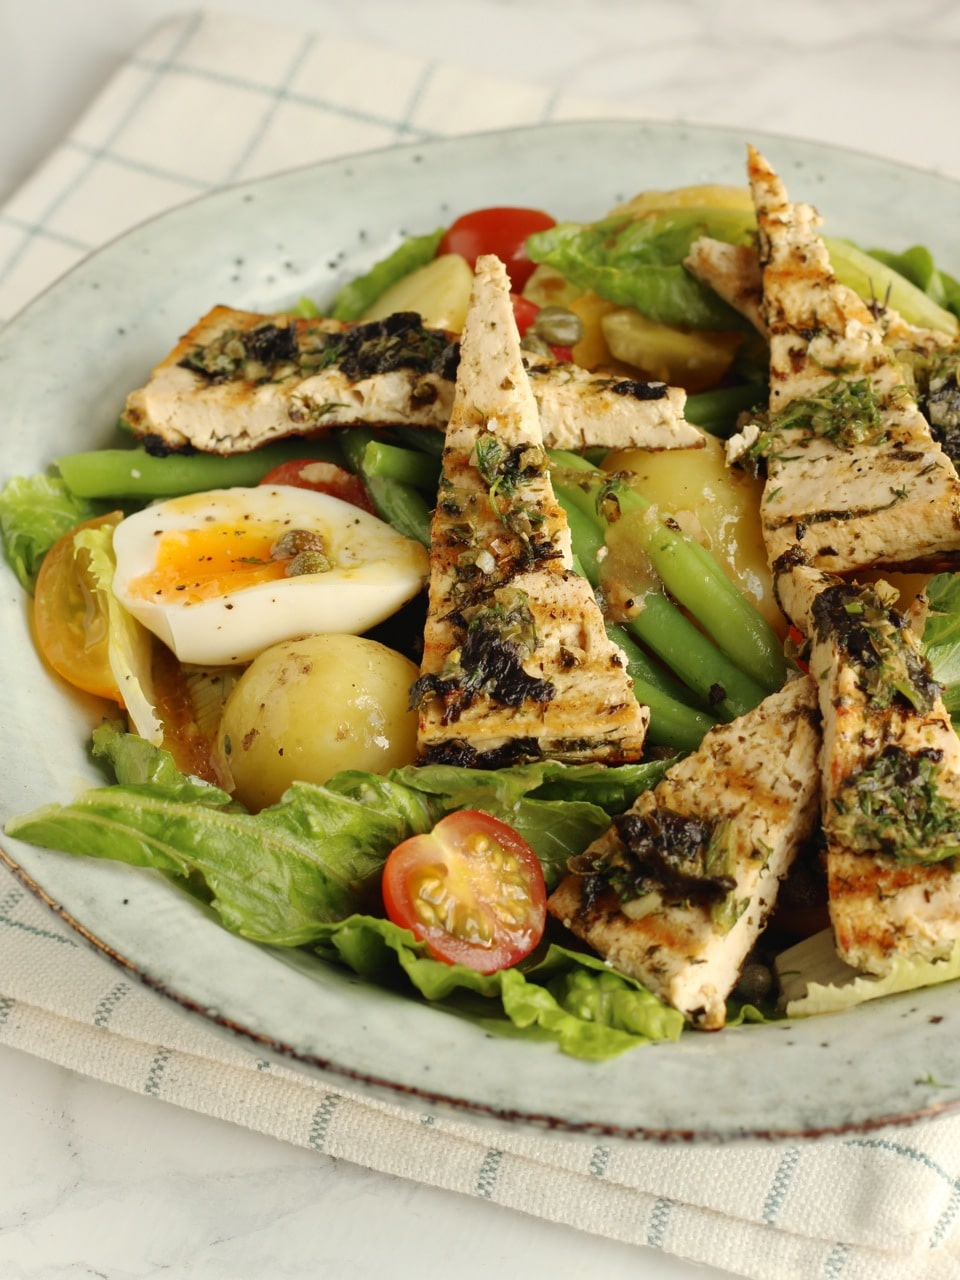 Tofu Nicoise Salad, a vegetarian or vegan take on this French Salad | Natural Kitchen Adventures